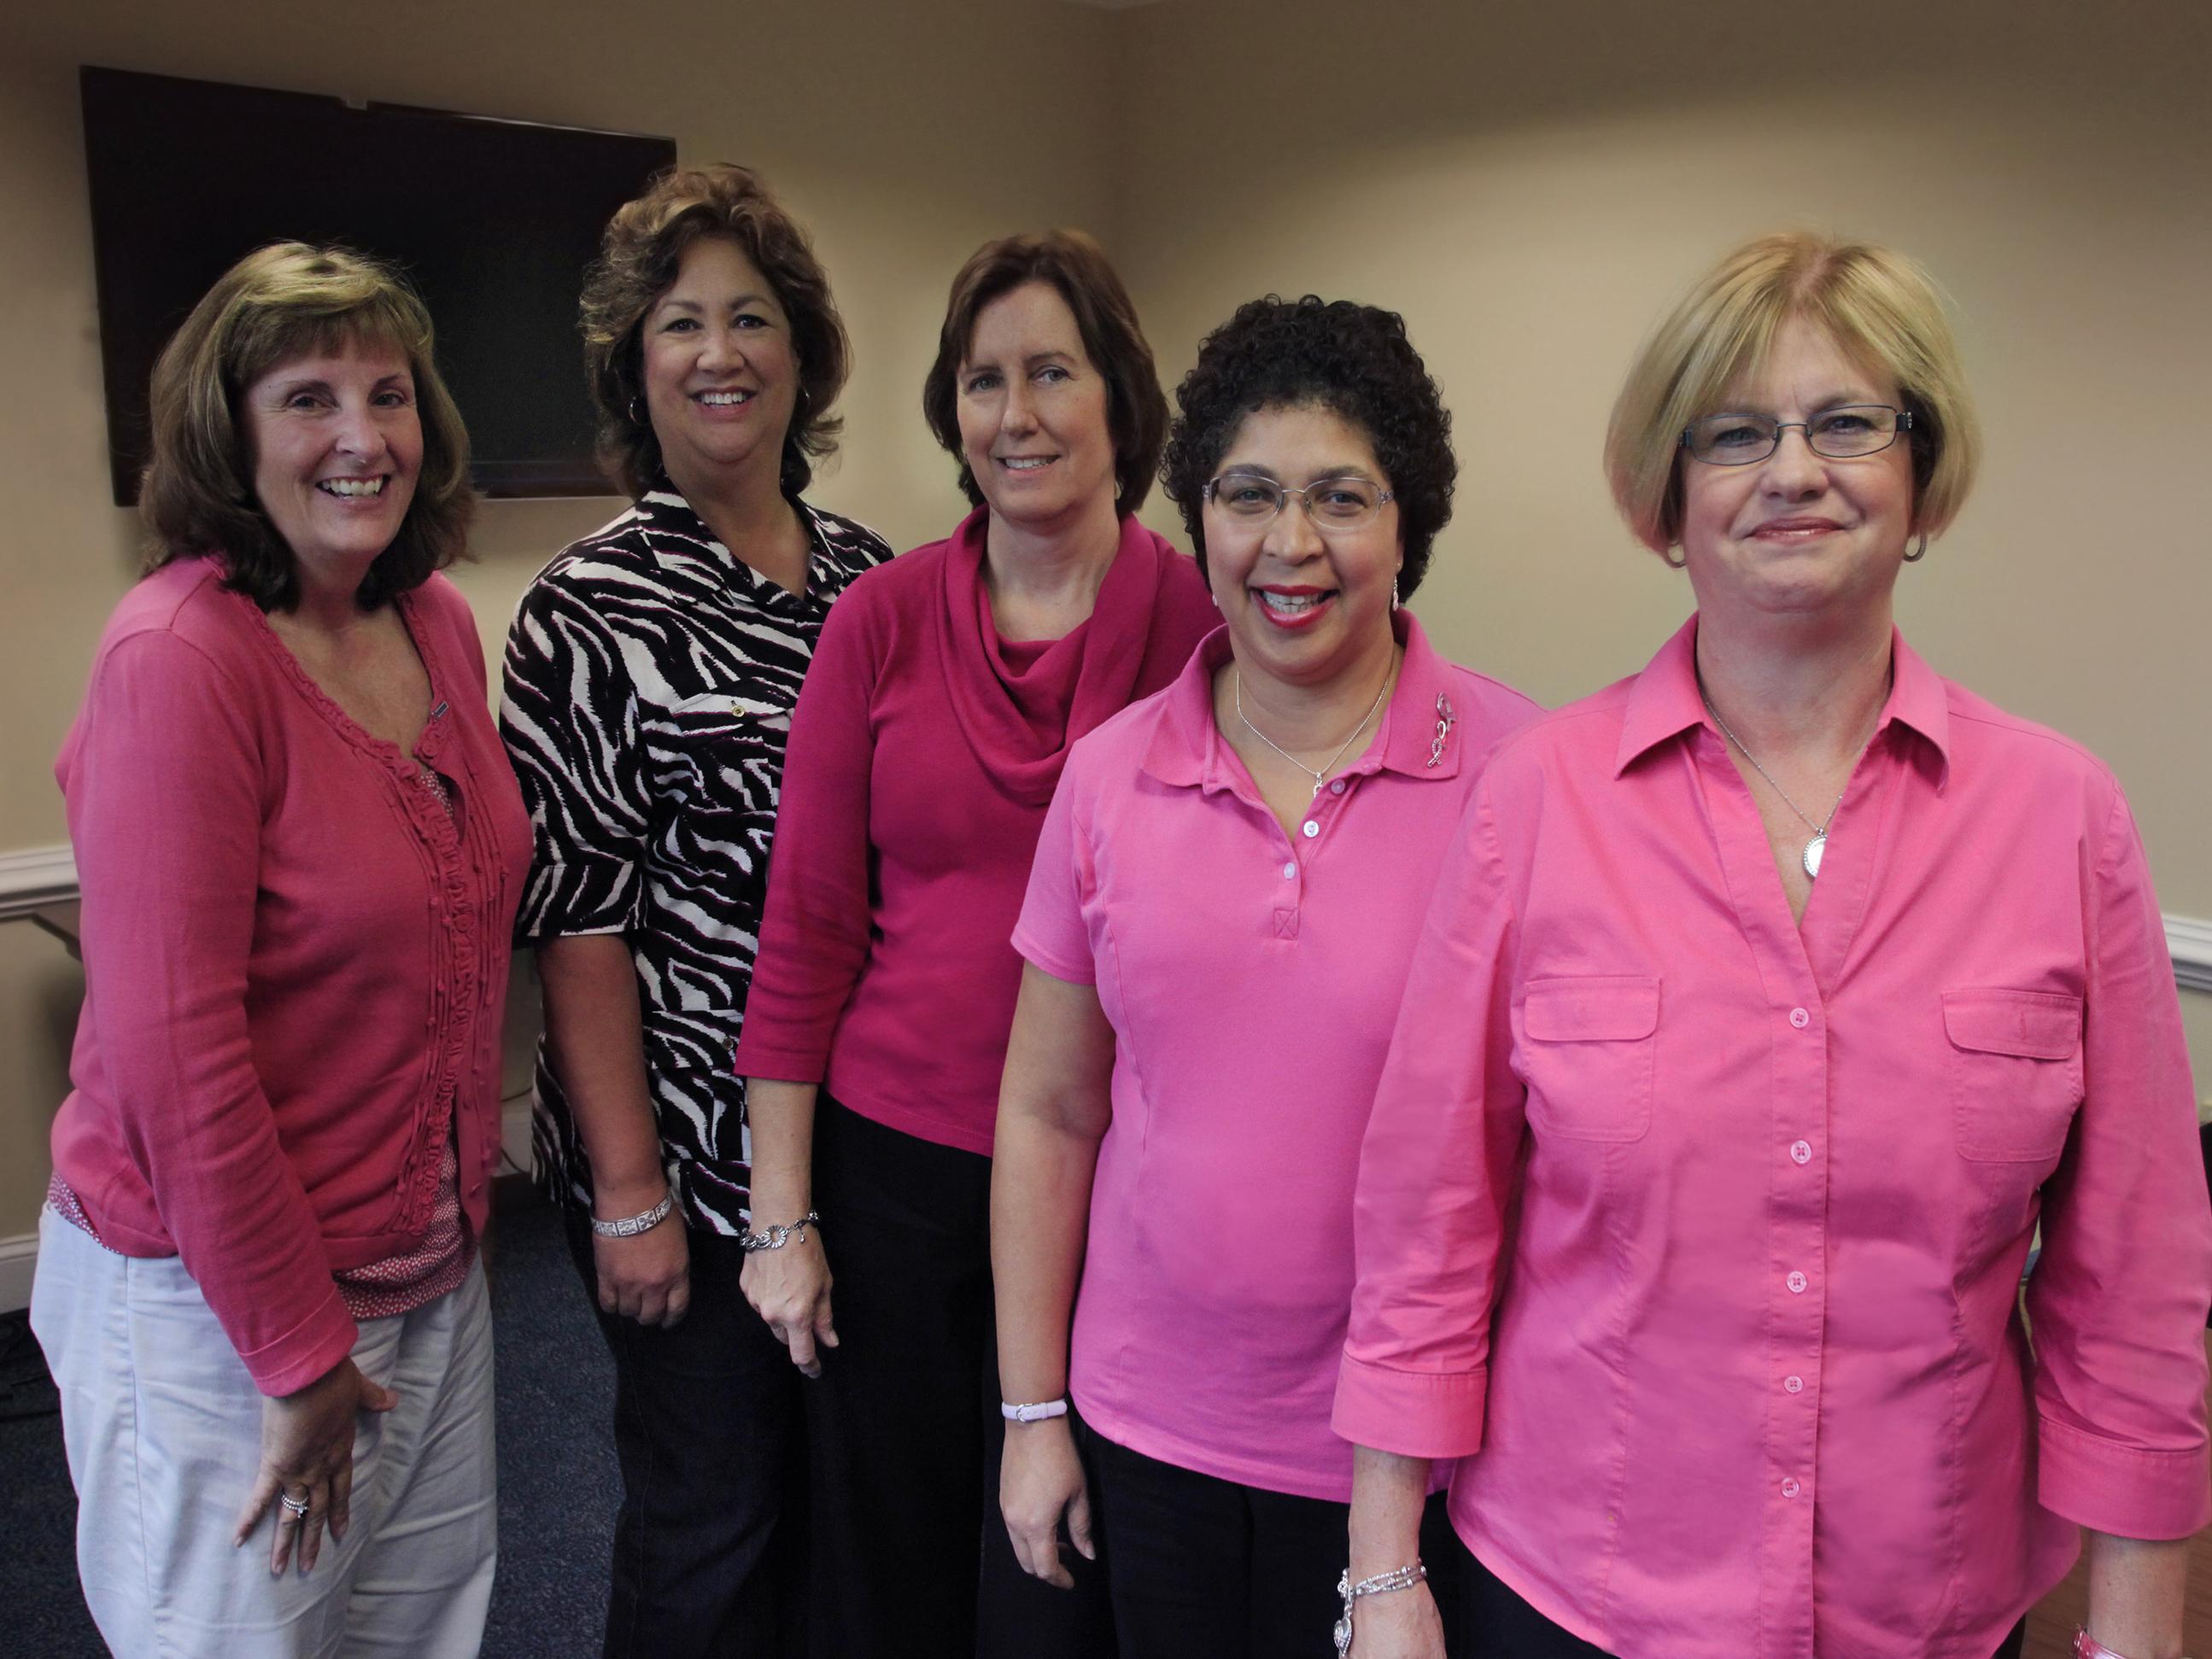 Breast cancer survivors dating site